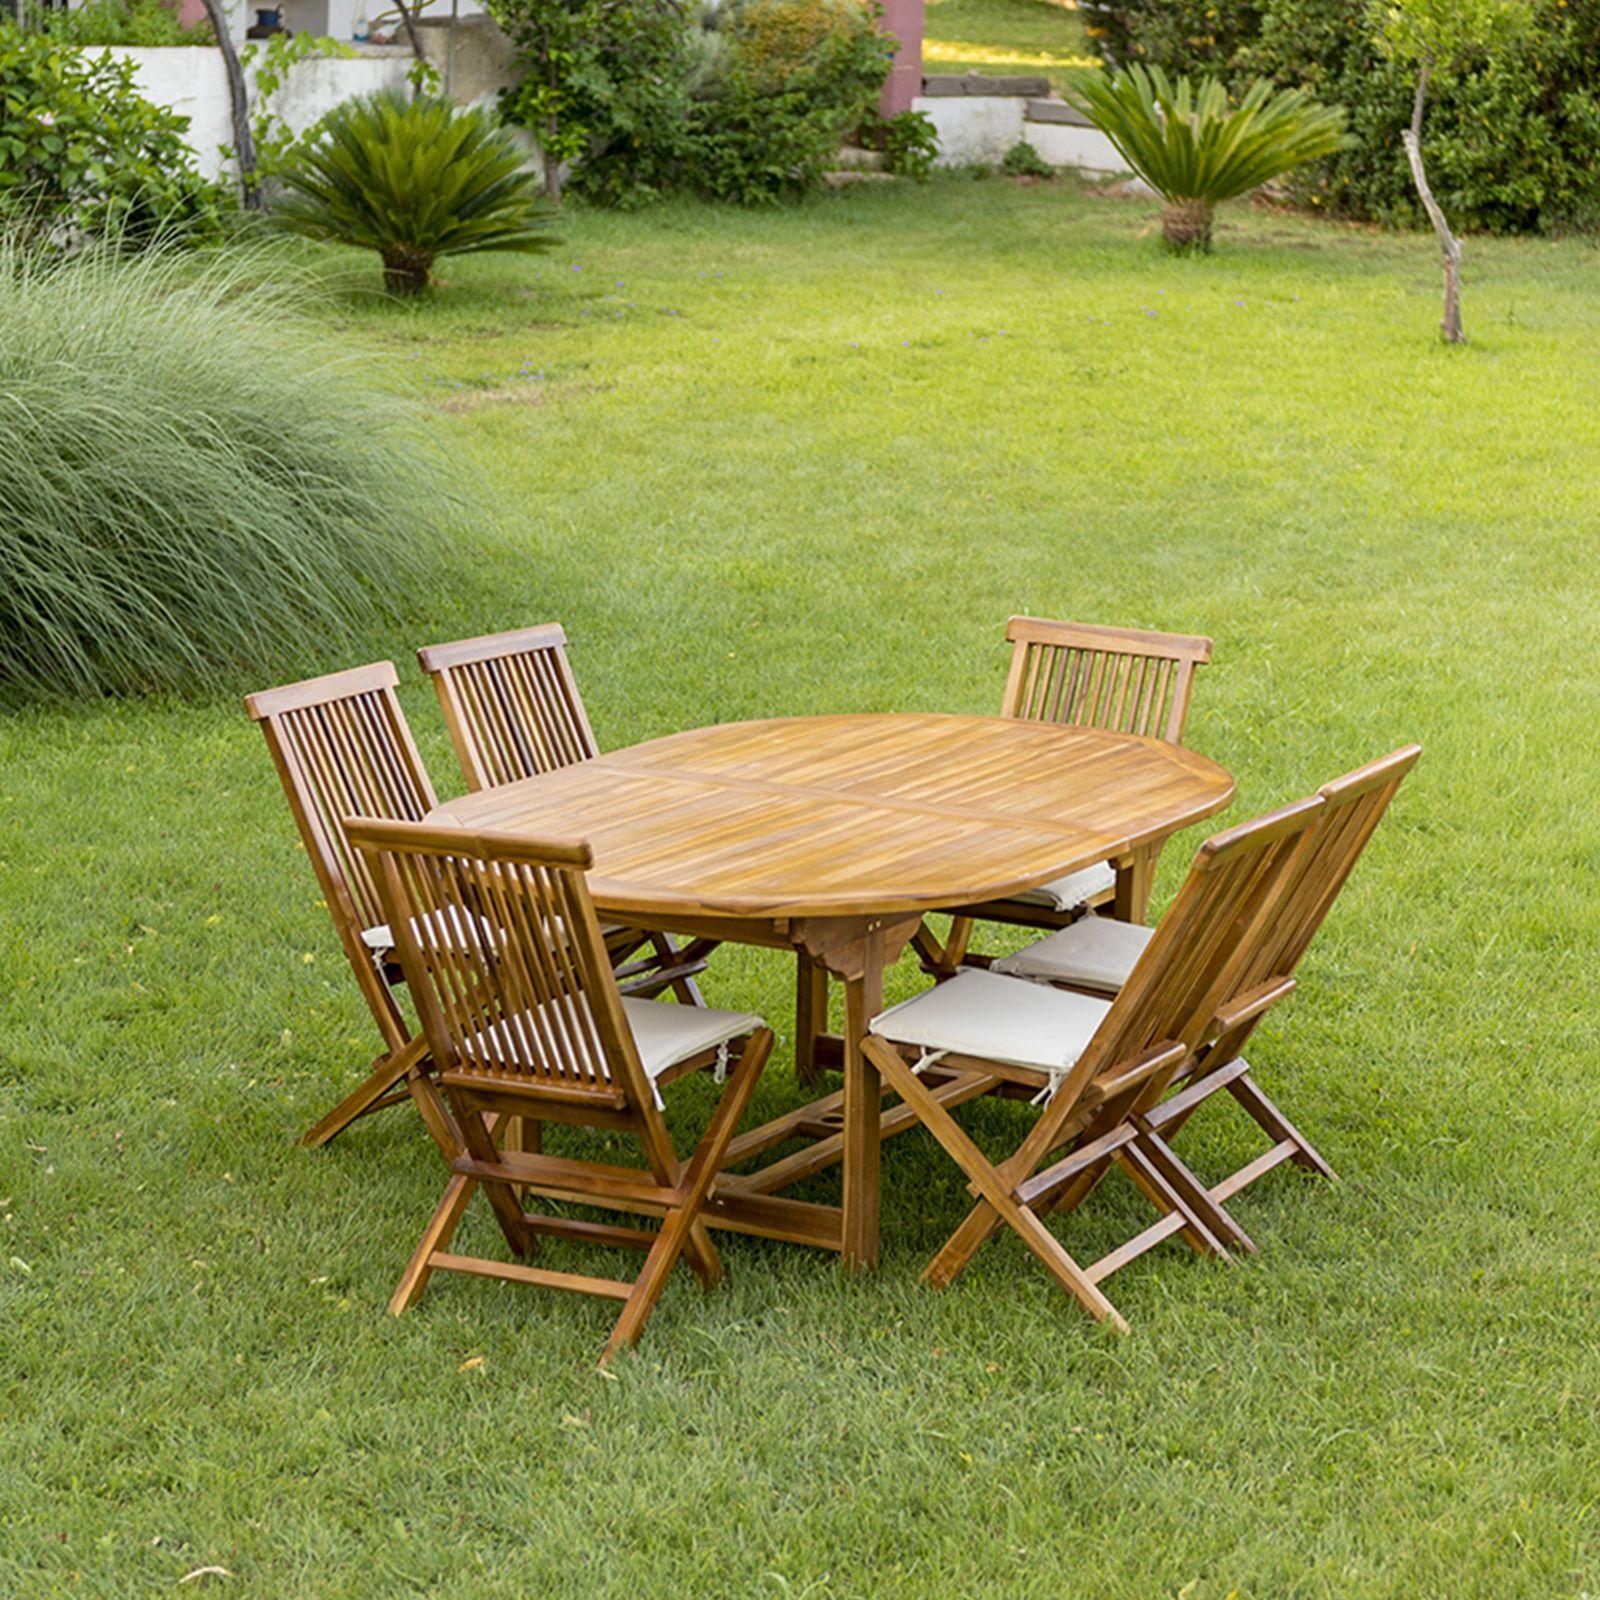 Set pranzo giardino con 6 sedie e 1 tavolo tondo ...